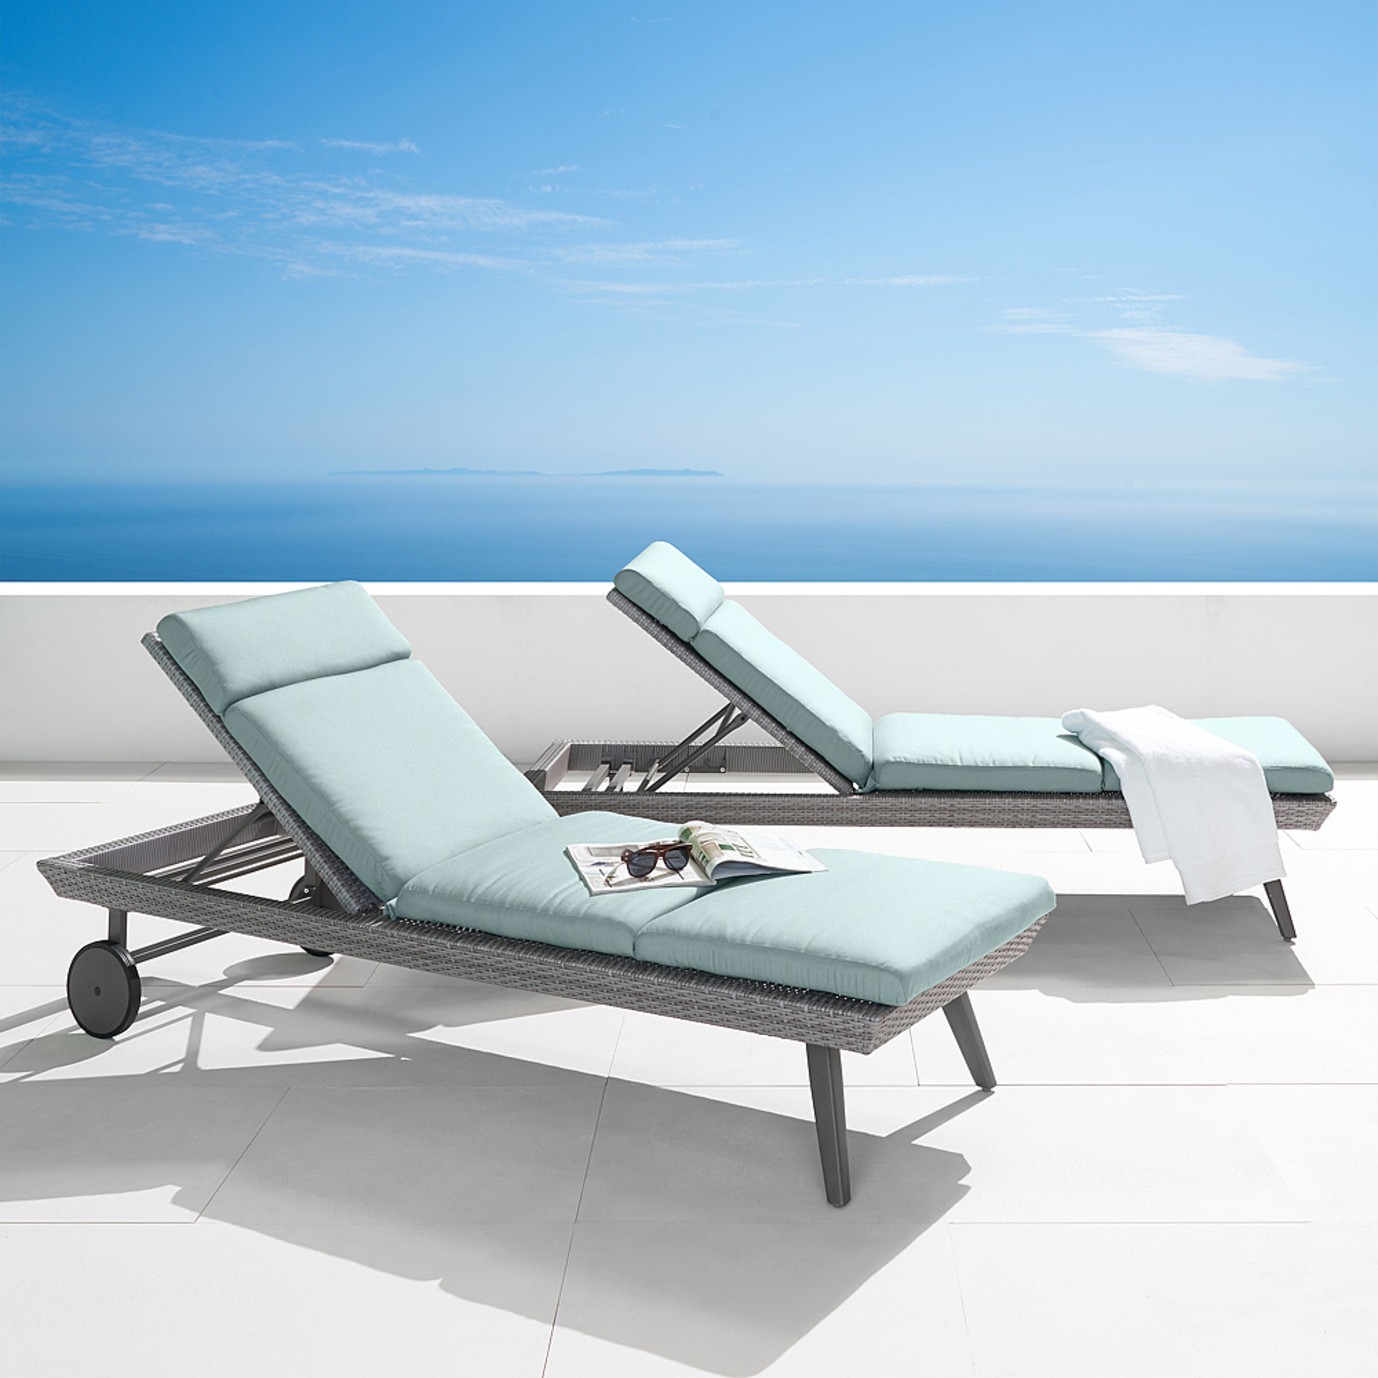 Portofino® Casual 2 Piece Lounger and Mattress - Spa Blue